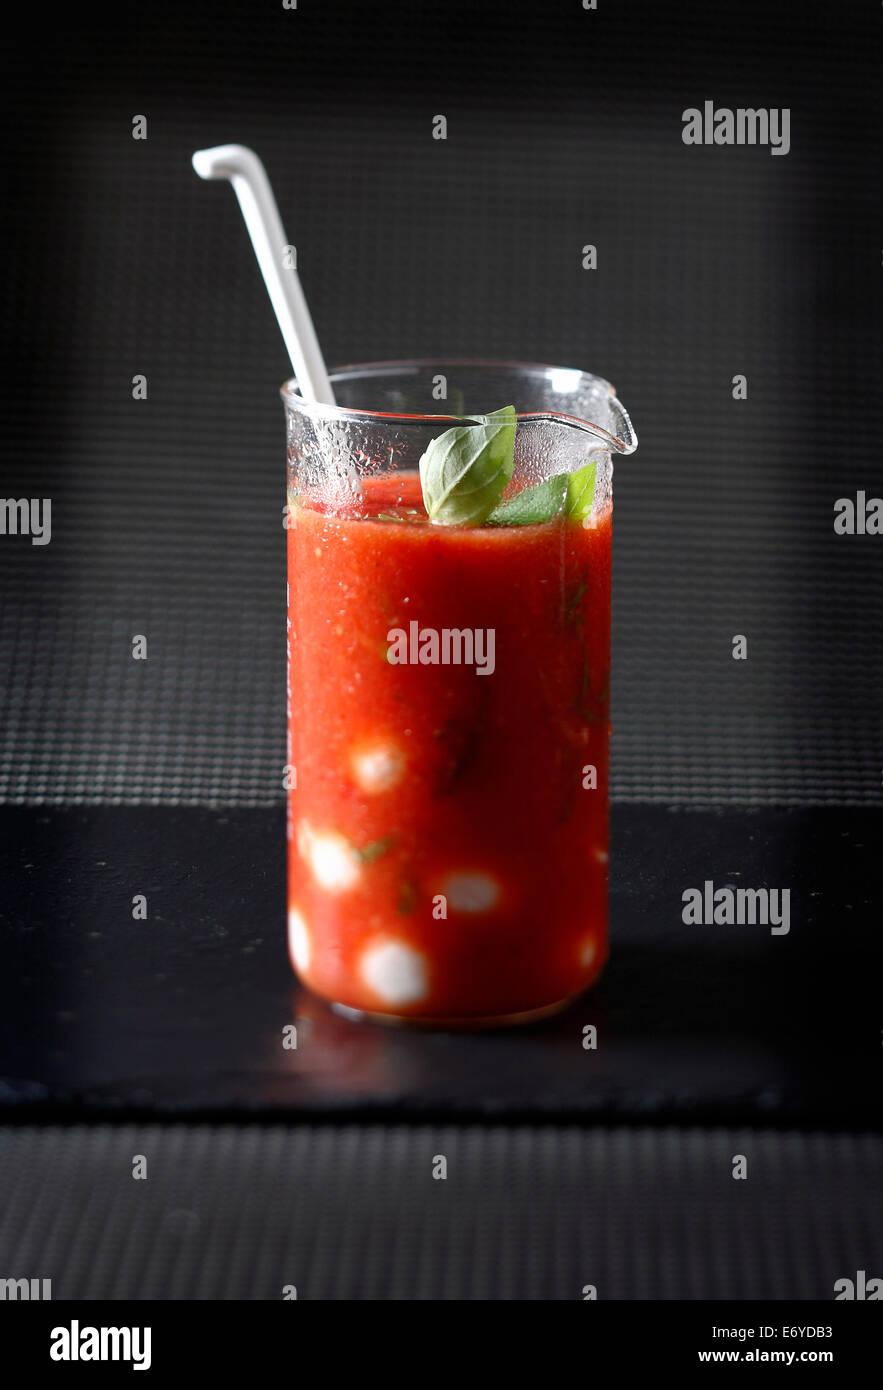 Tomato juice with basil - Stock Image